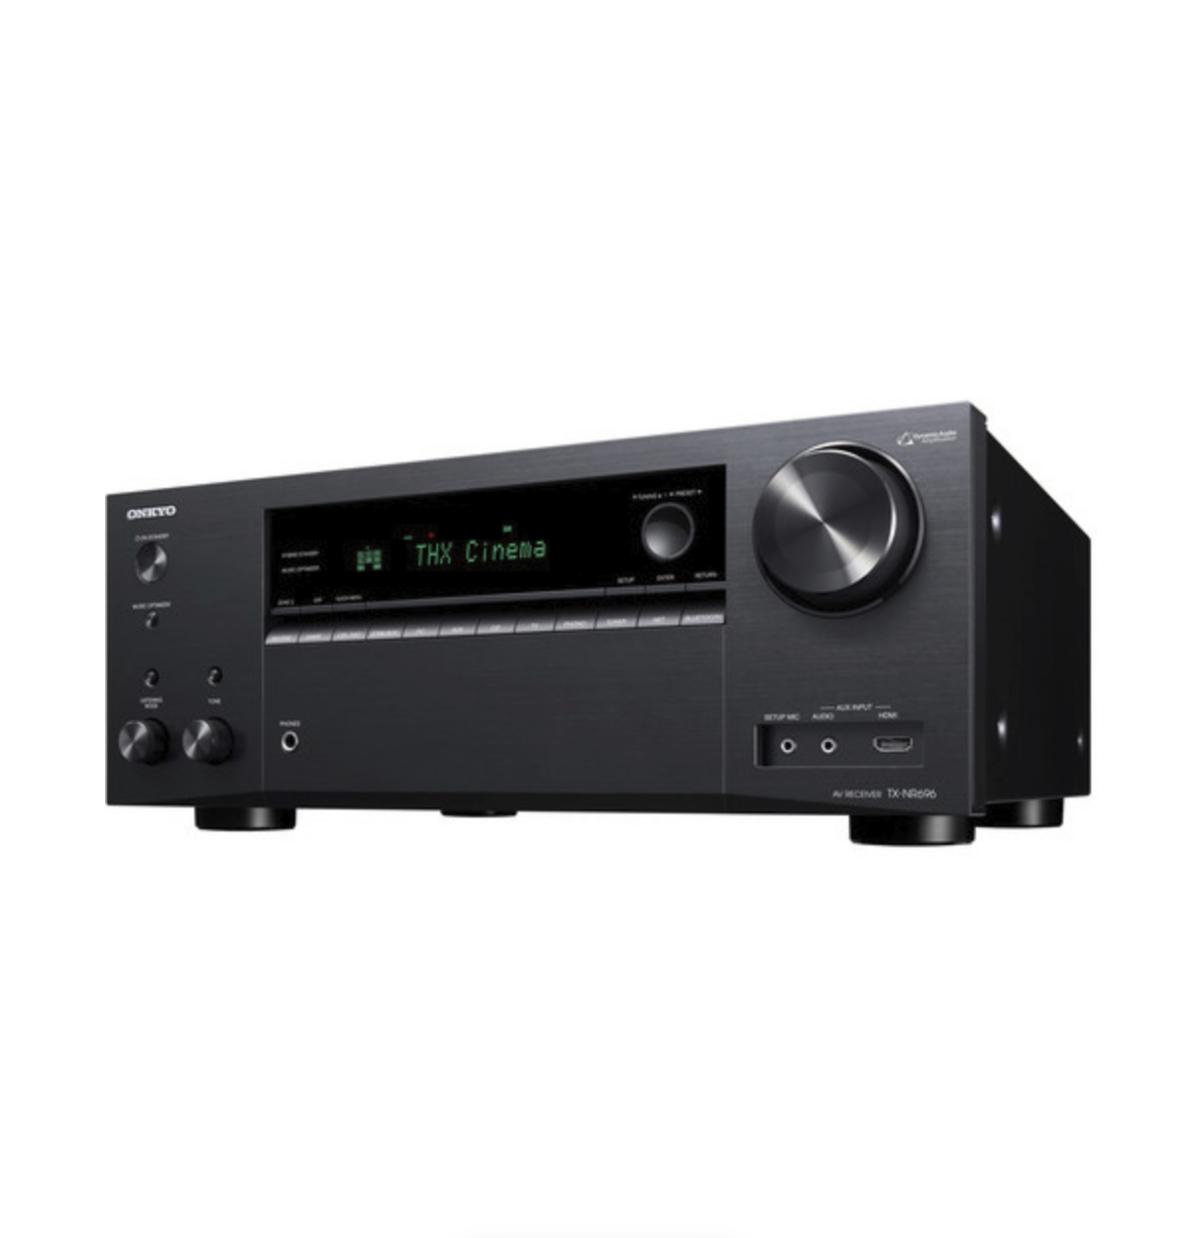 Onkyo - TX-NR696 Receiver 7.2 canais 110W Dolby Atmos Bluetooth Wifi 4K Zona 2 Certificado THX 110V